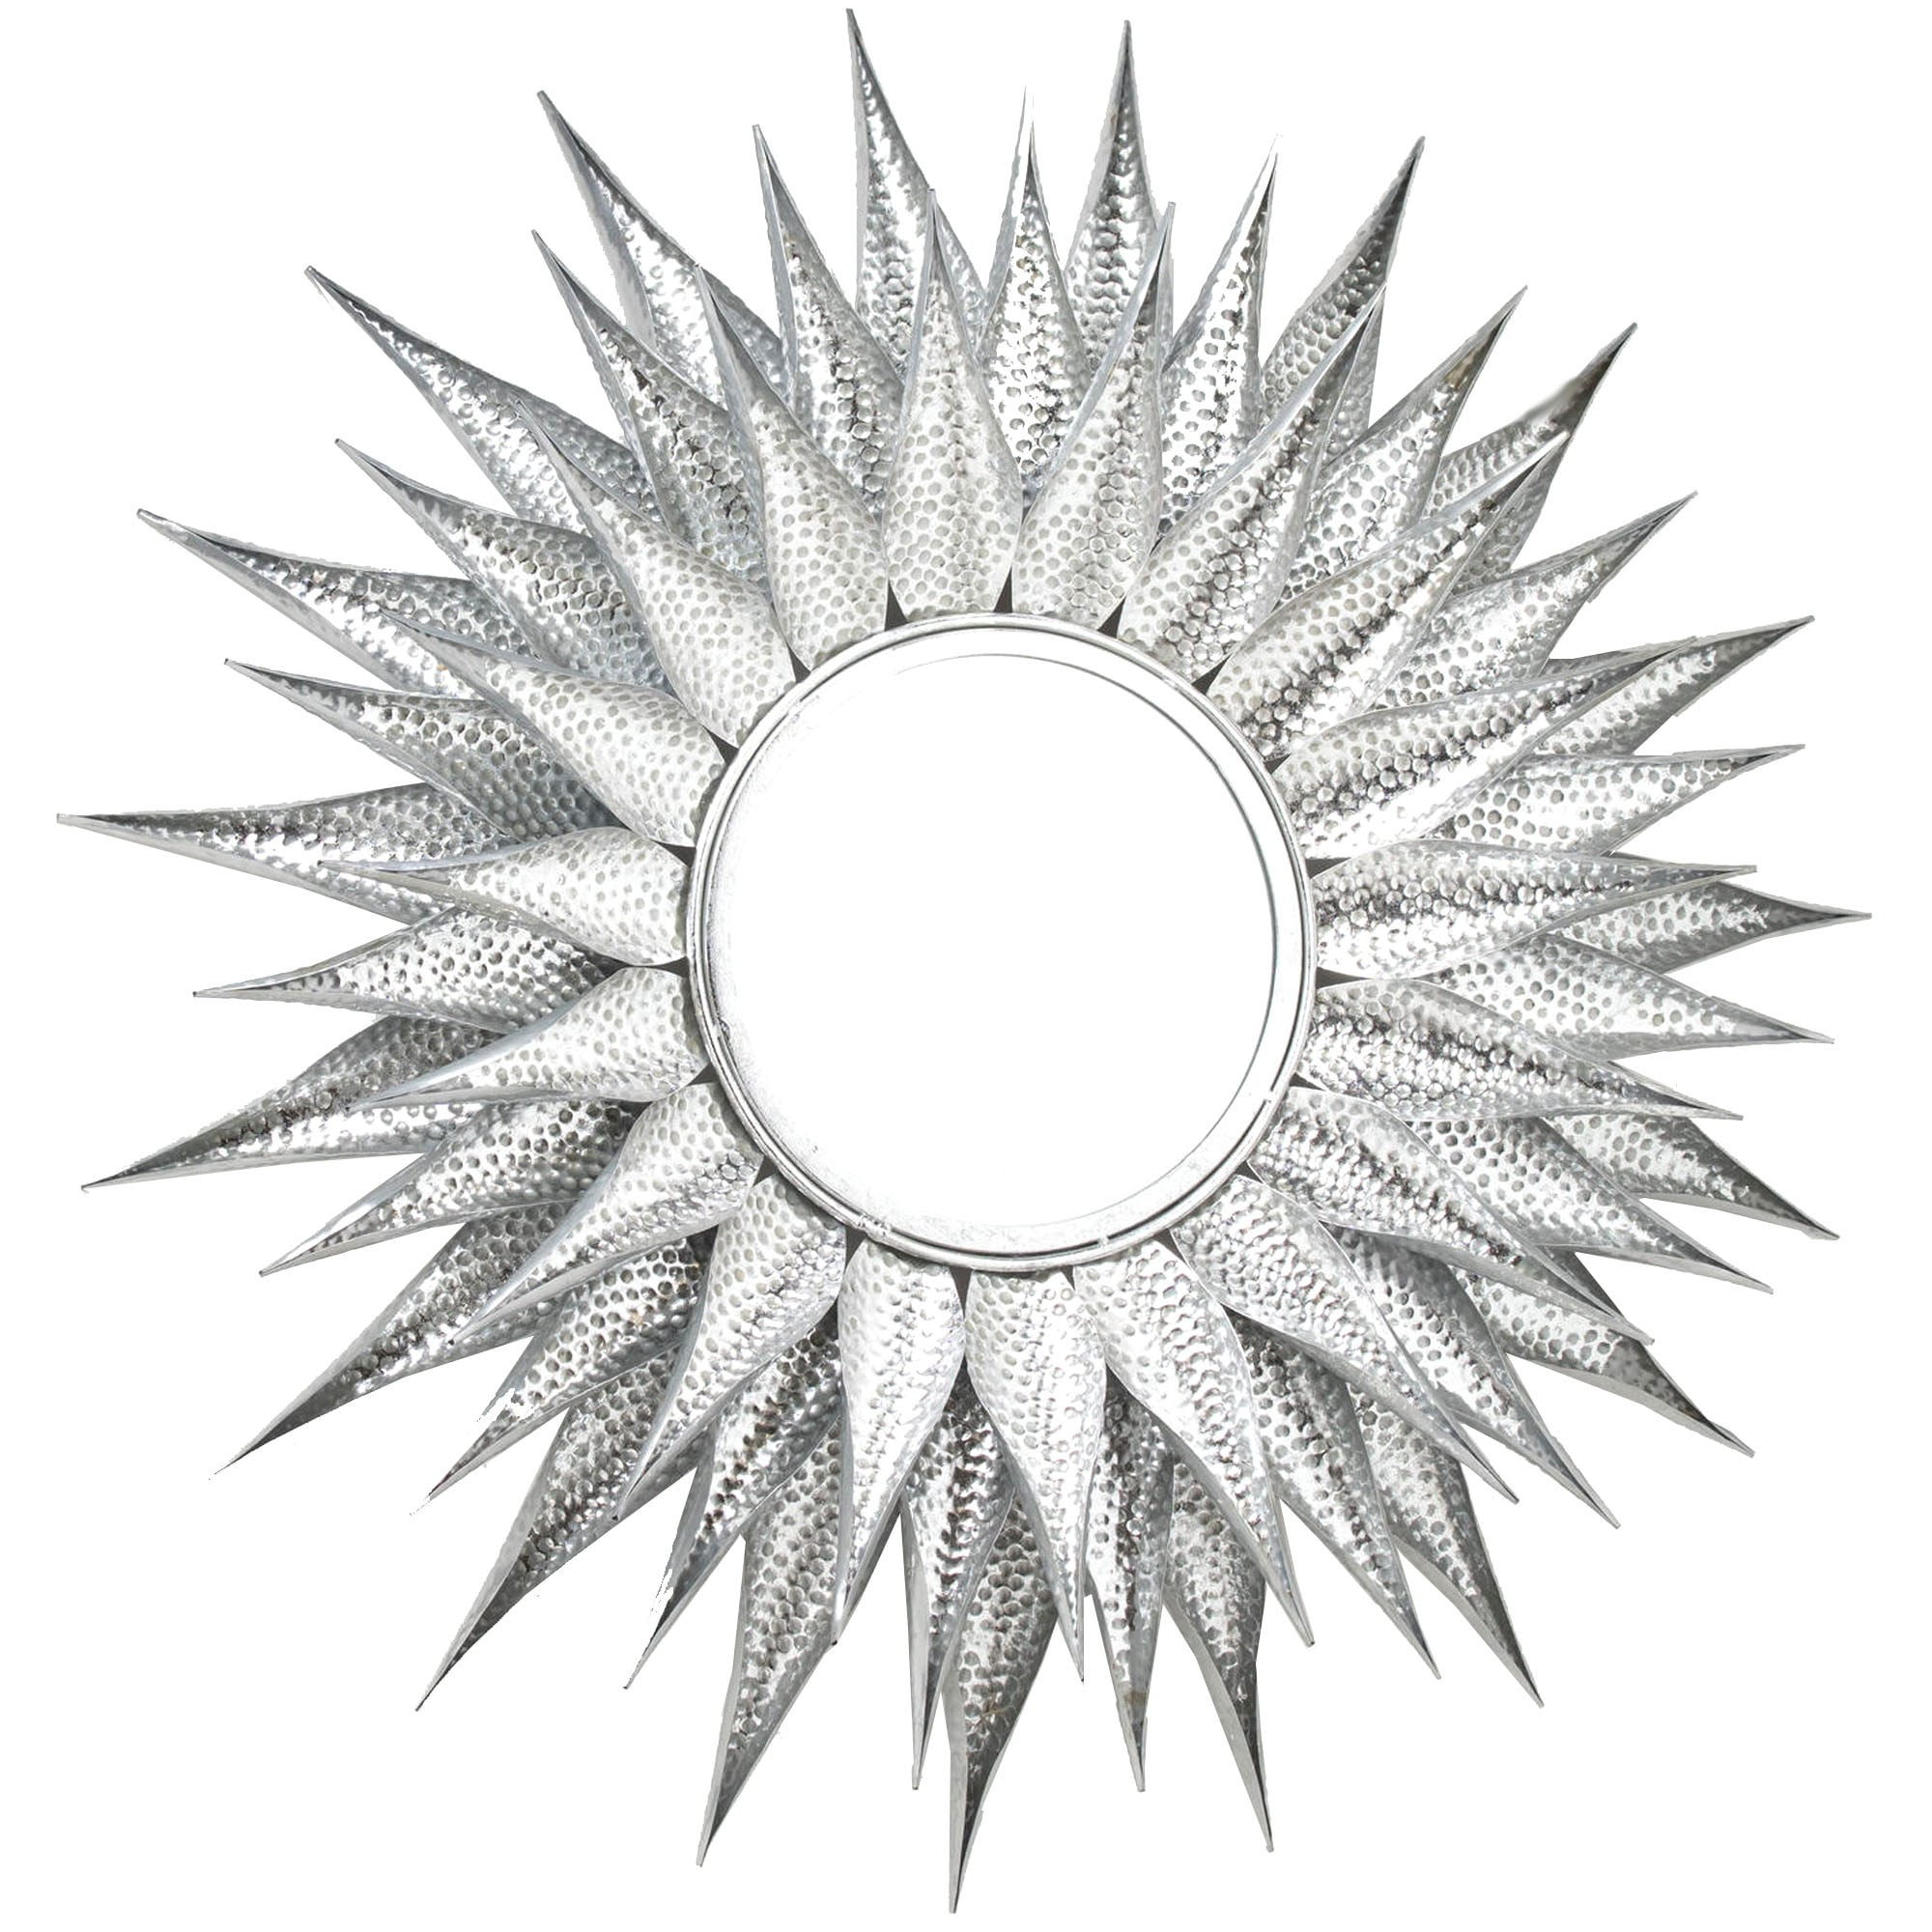 Silver Sunburst Mirror Wall Mirrors Decorative Mirrors